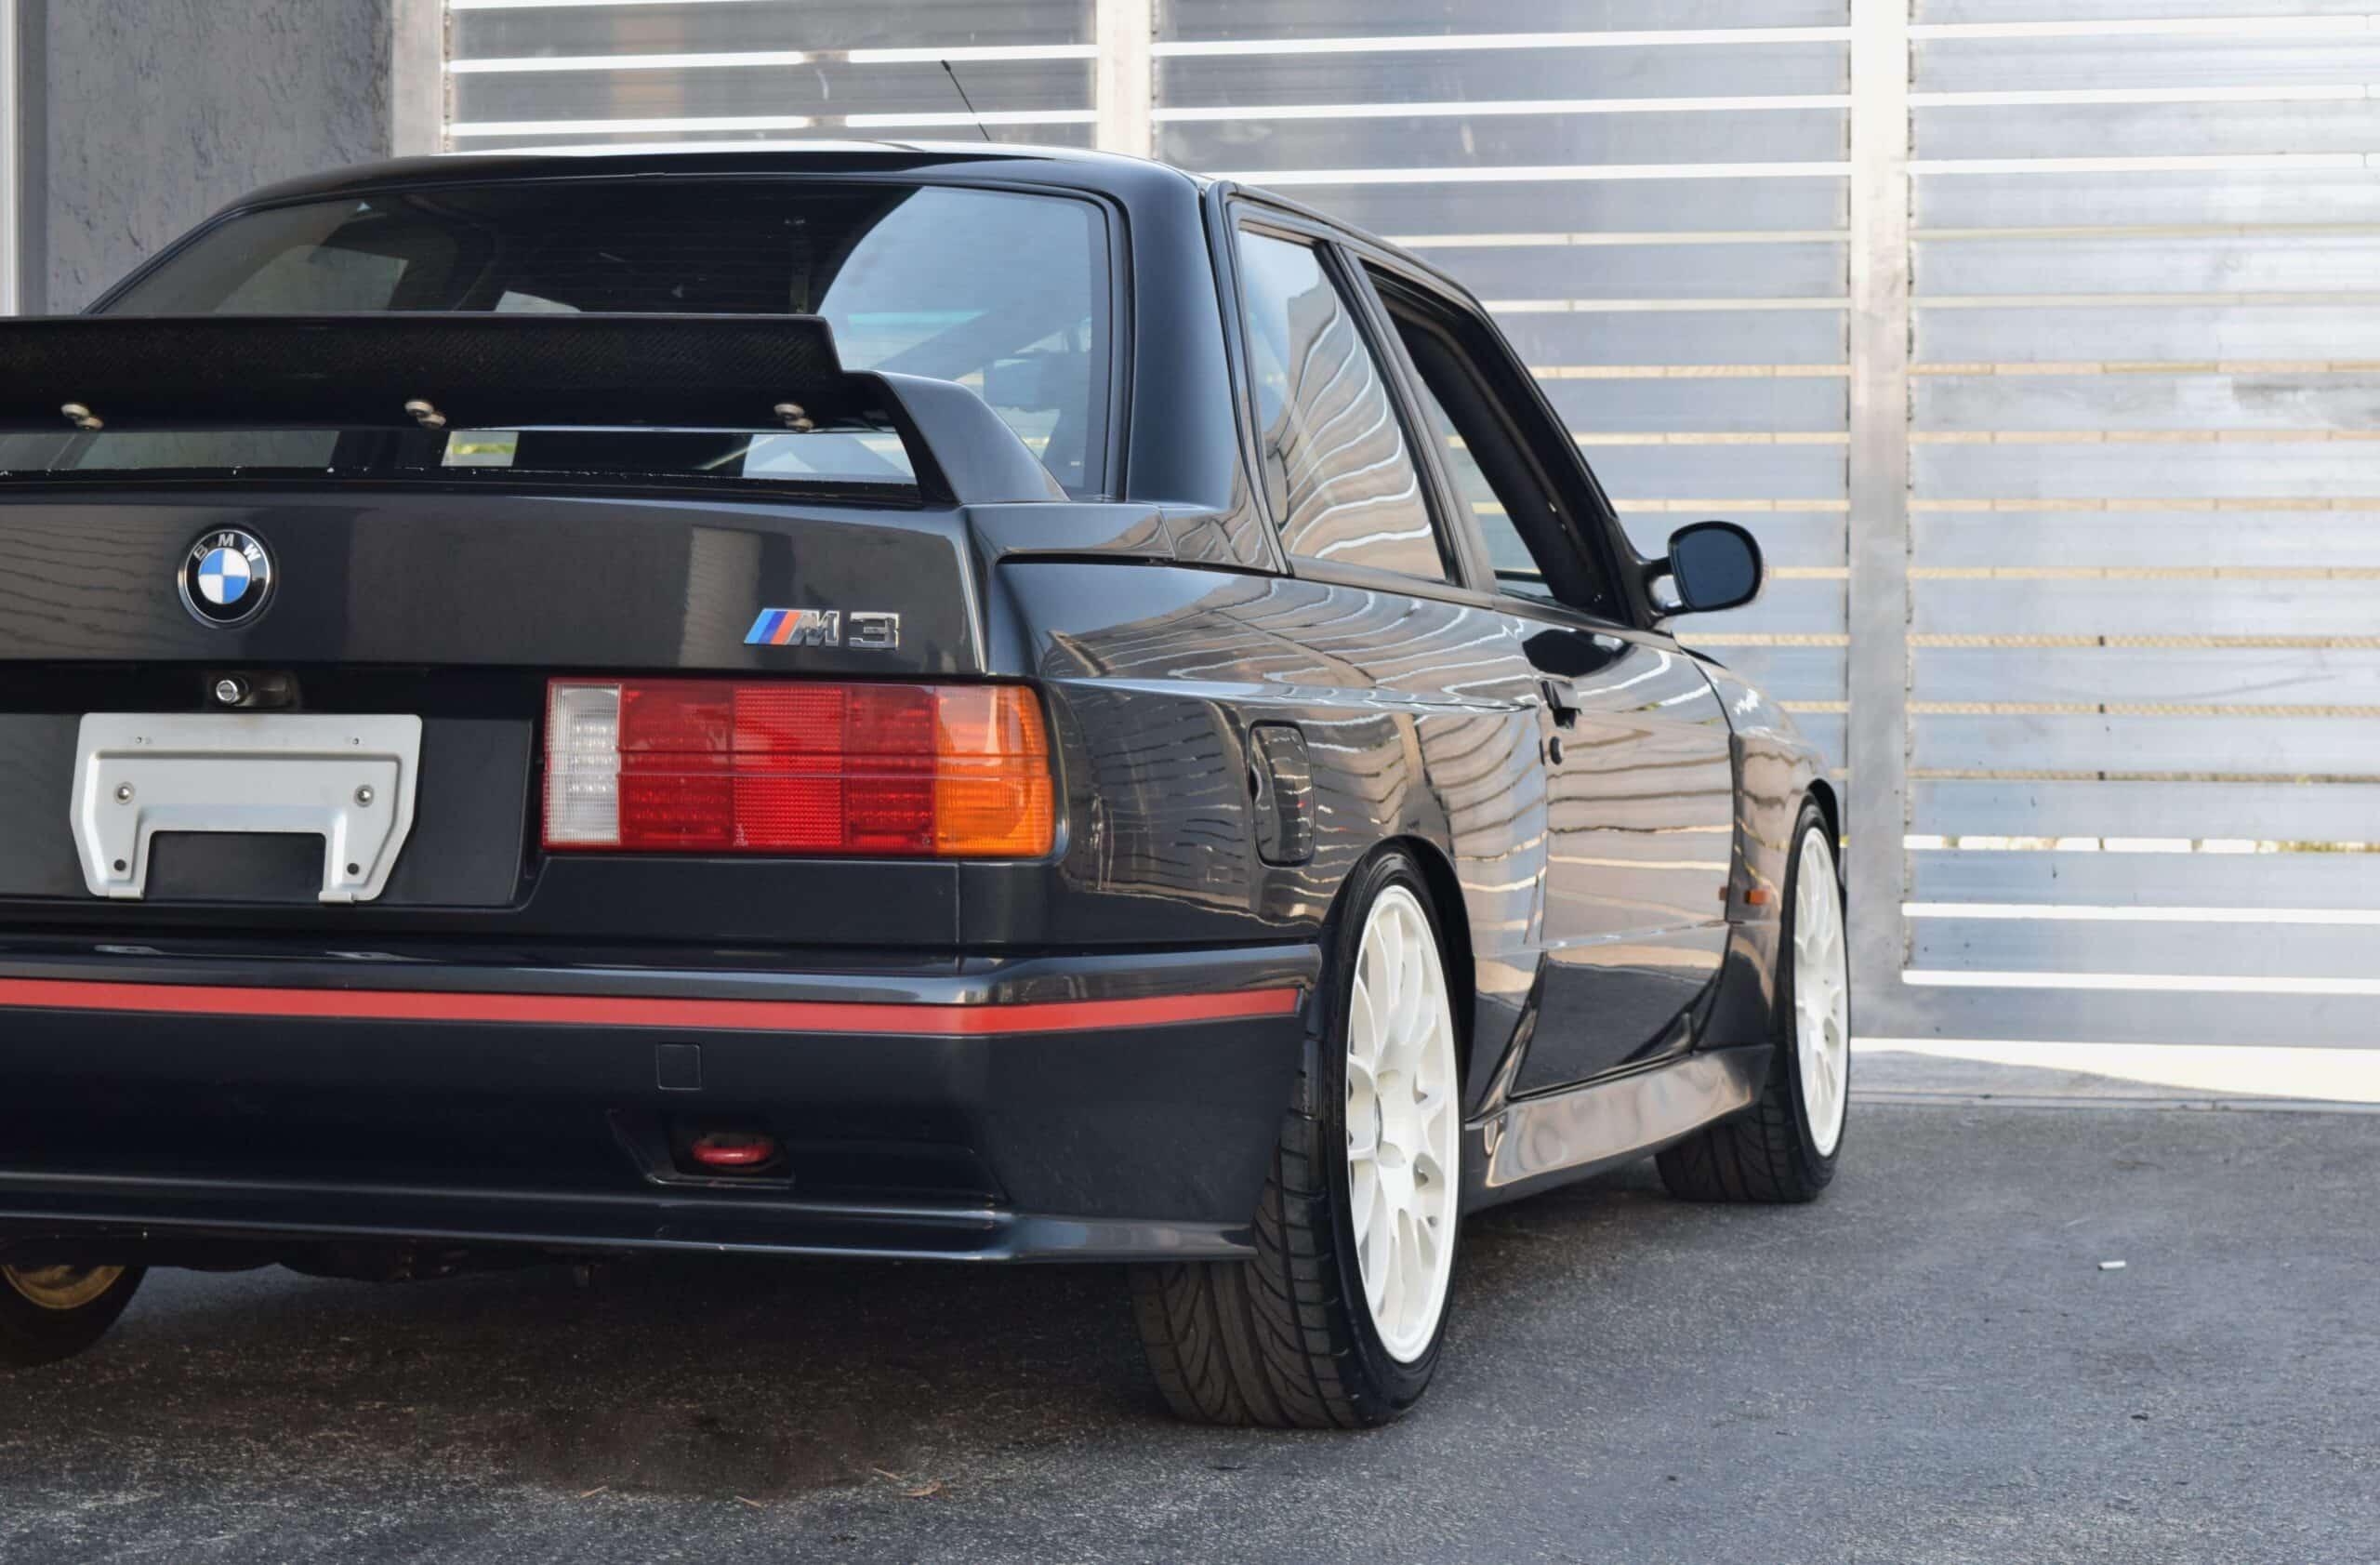 1987 BMW M3 E30 Euro Spec 265 HP EVO S14 -DOG LEG-Slicktop- Ferrari F-40 Brakes- Fully Sorted & Documented